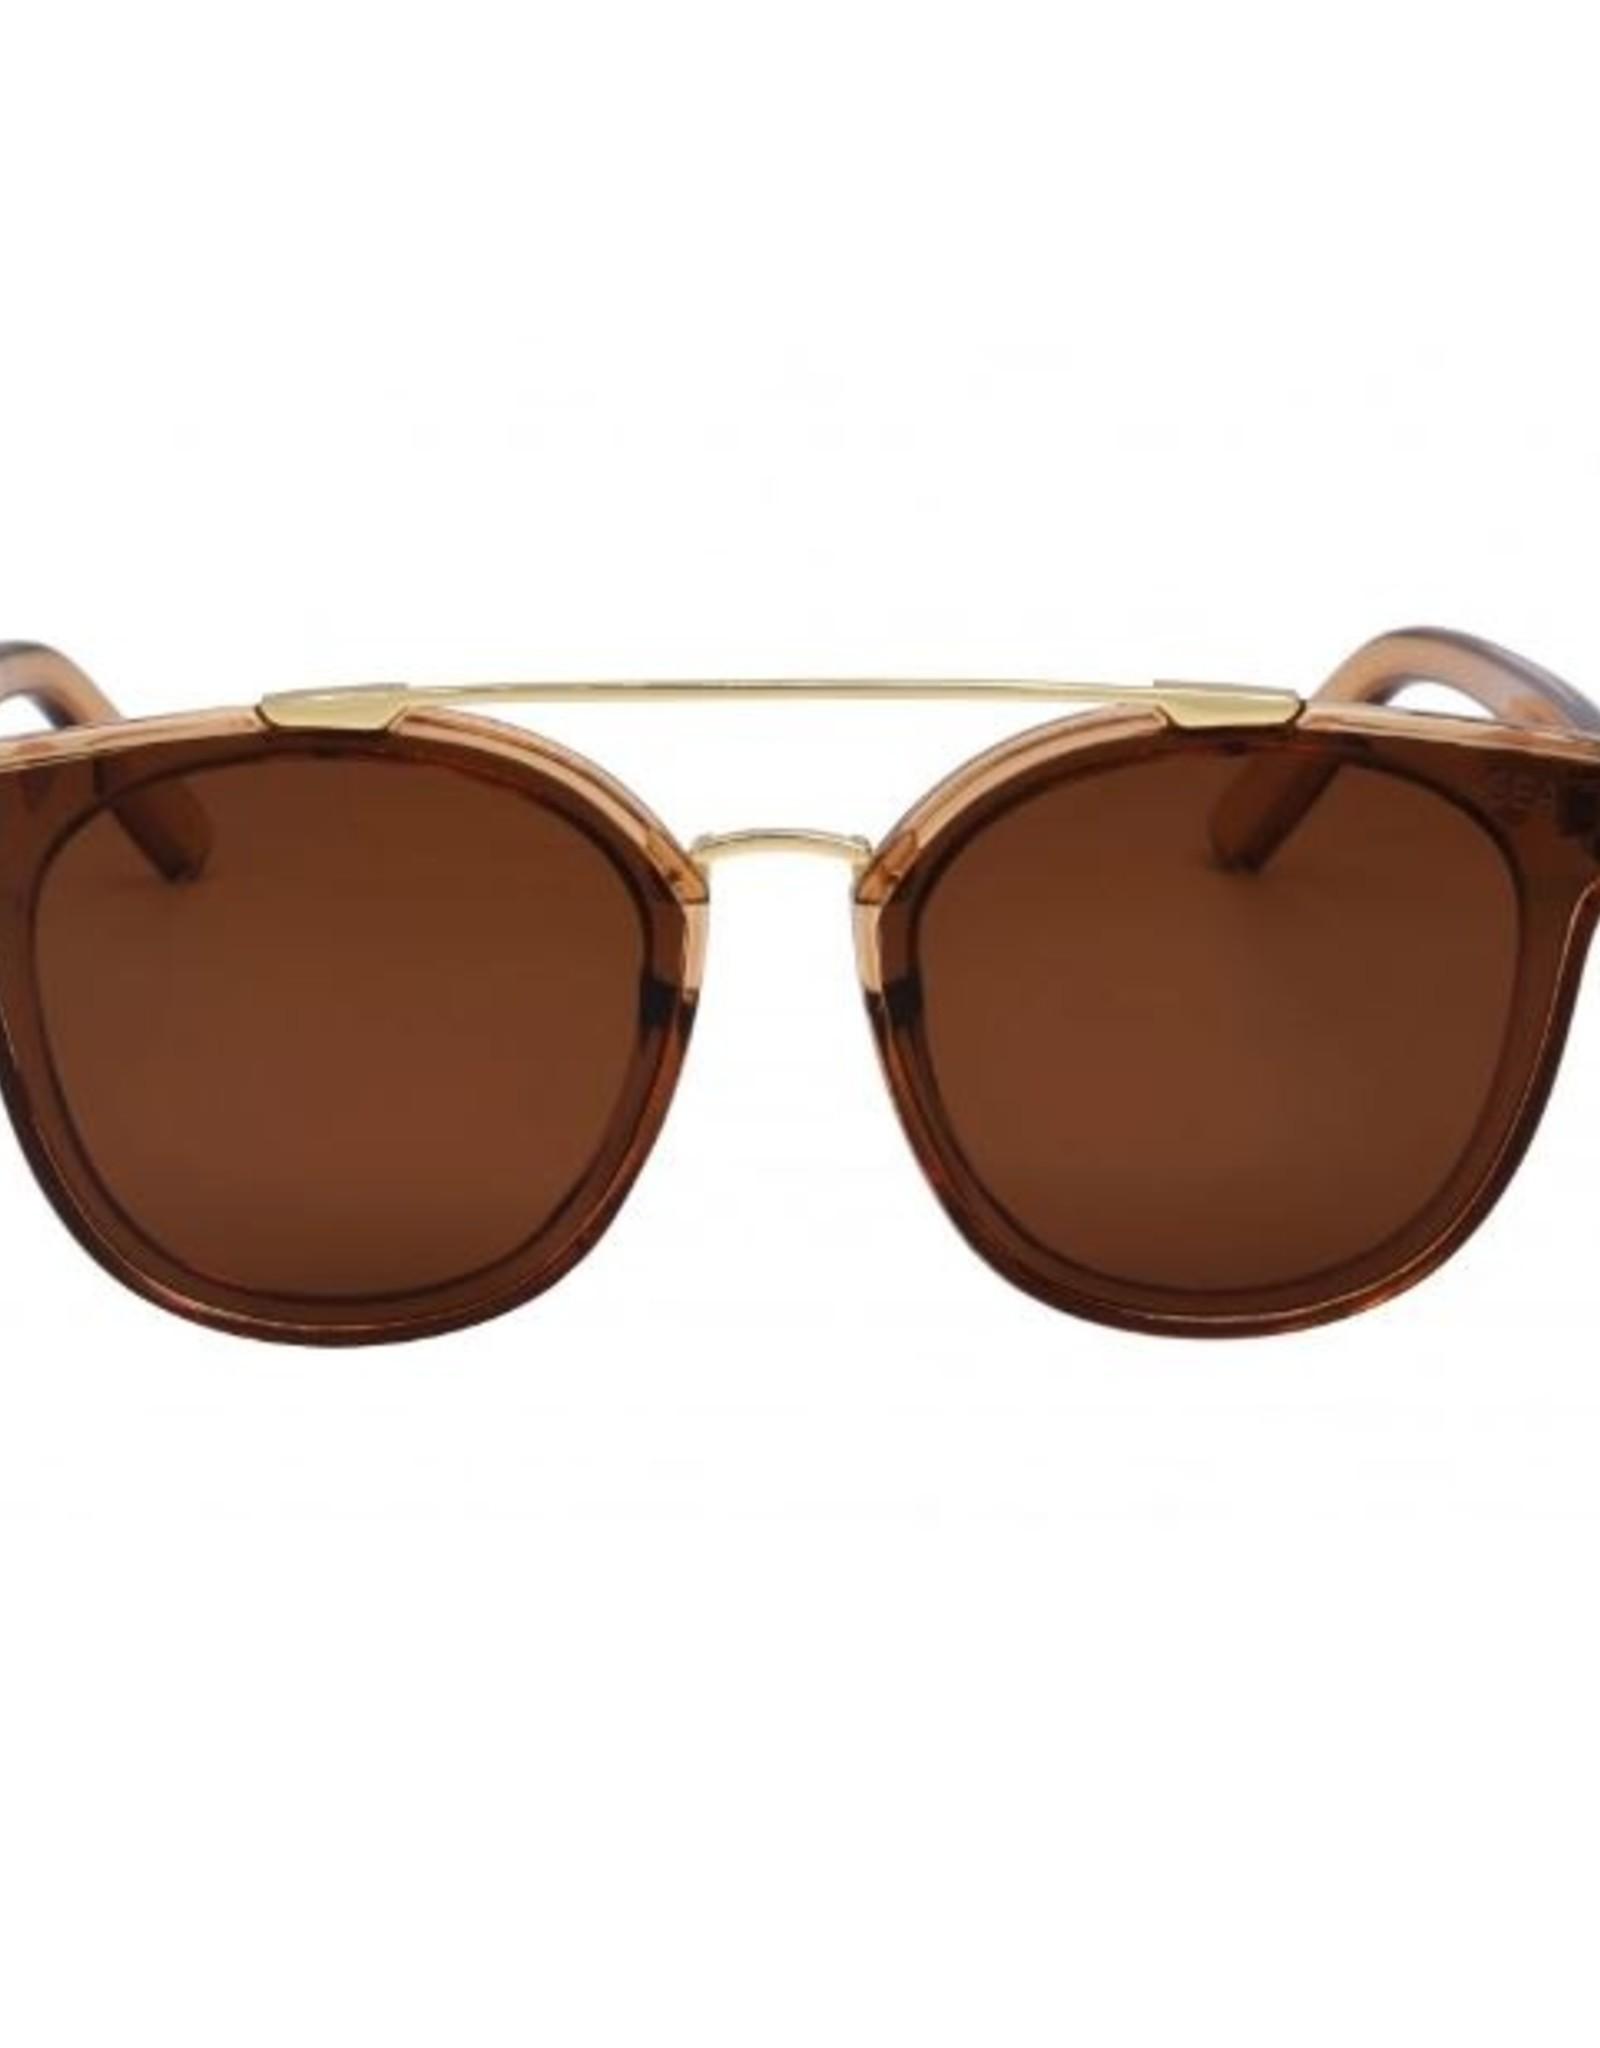 I SEA Topanga Sunglasses